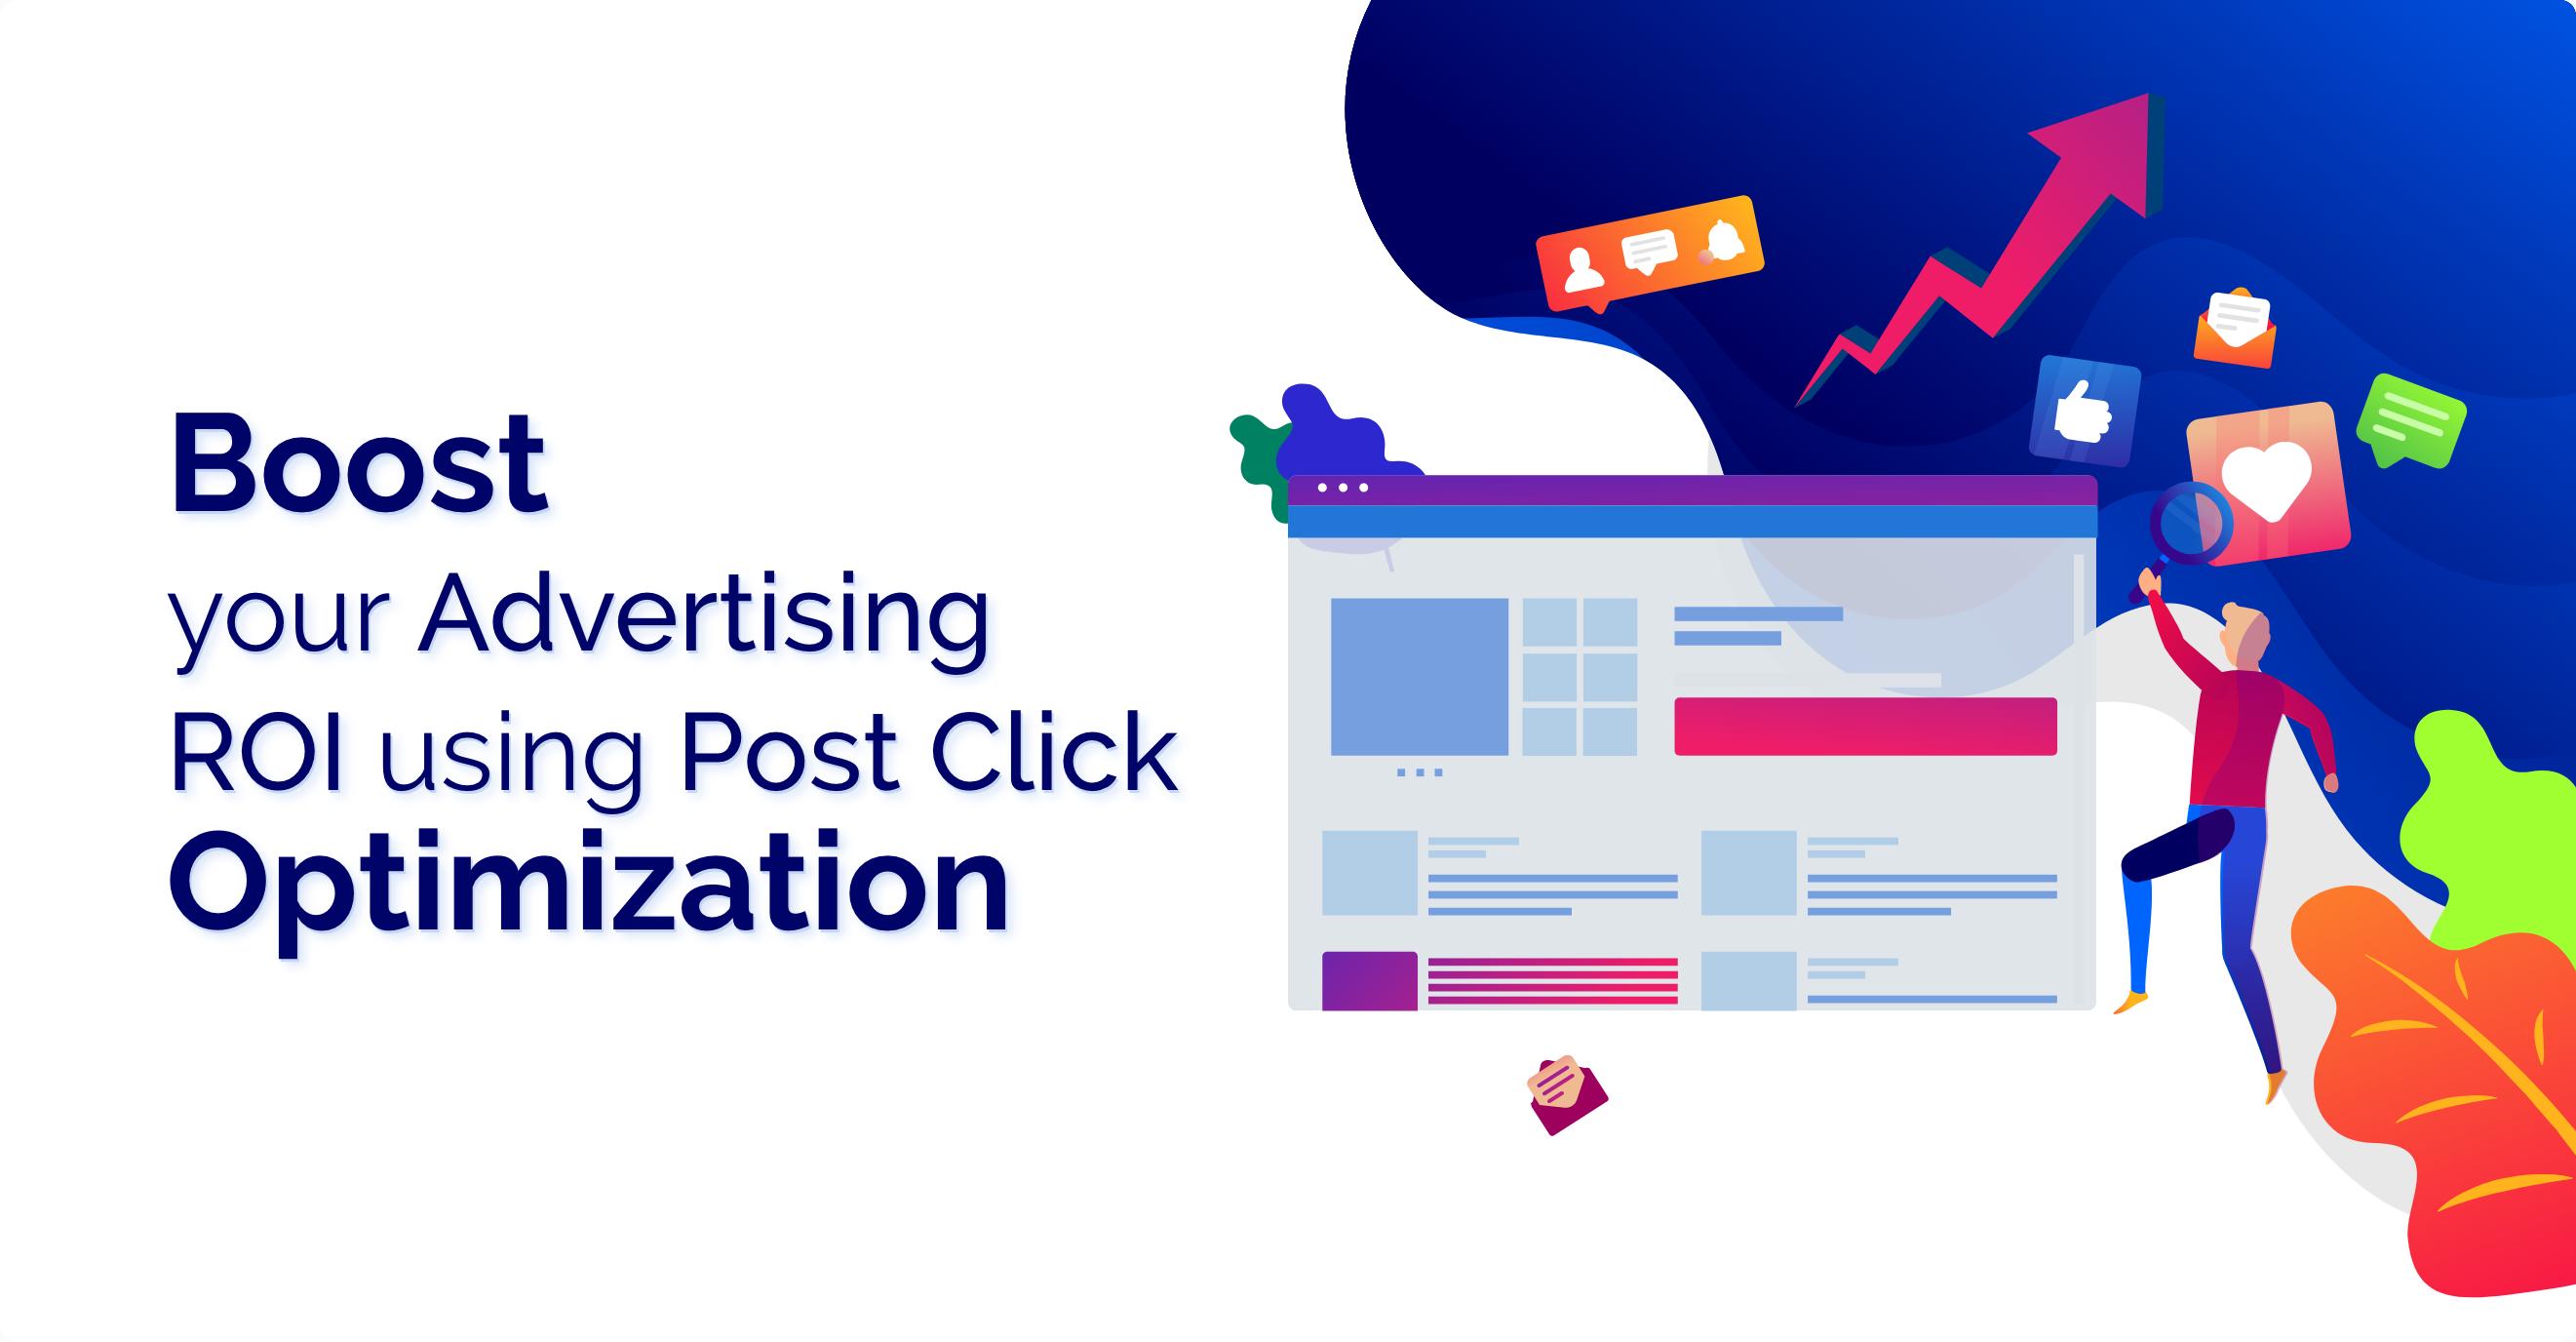 Increase advertising ROI - Replug